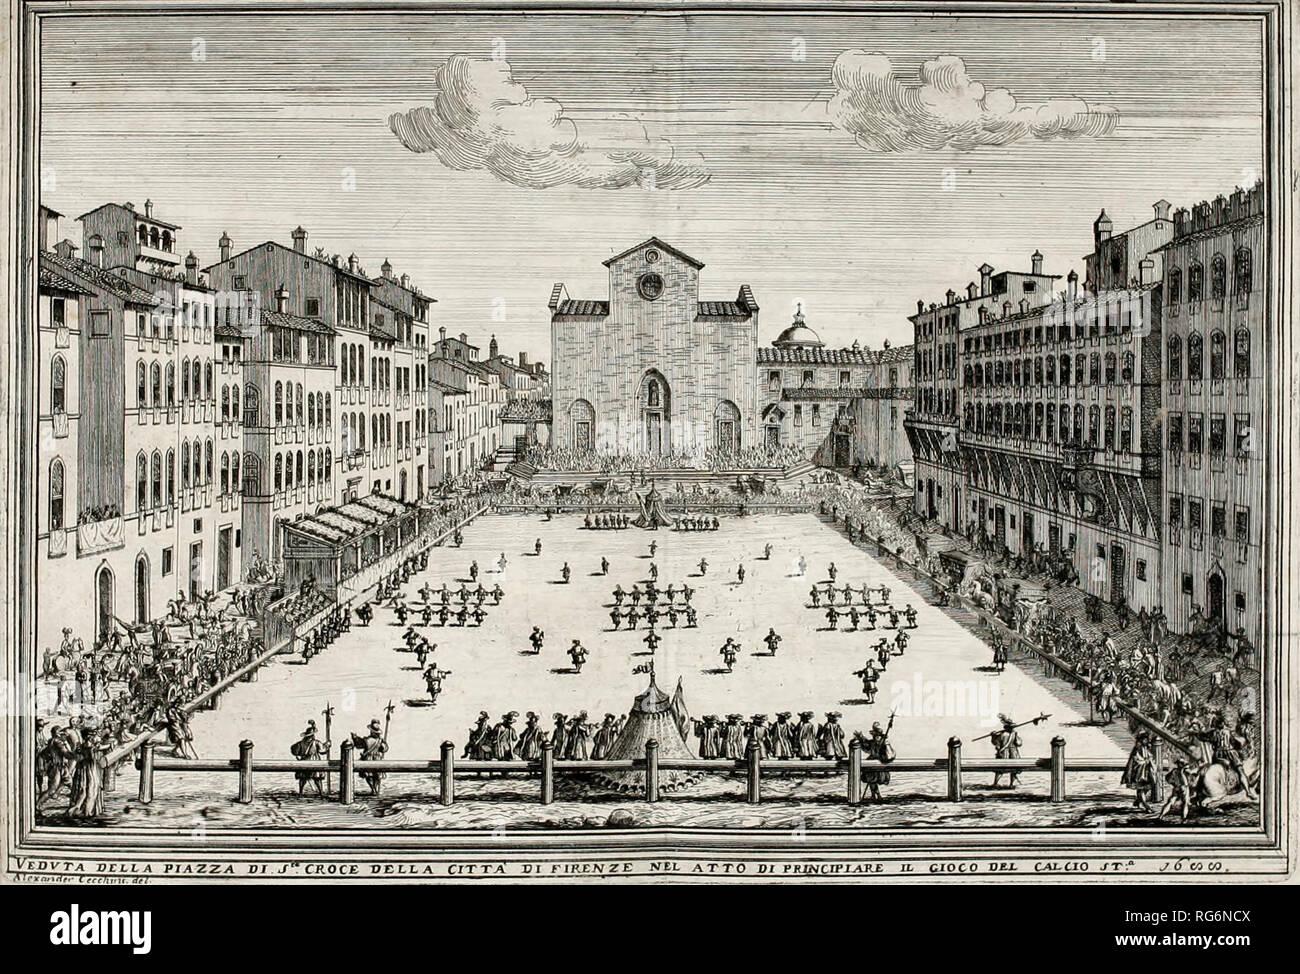 A Calcio Fiorentino (Historic Football) game played at Piazza Santa Croce, Florence, Italy, circa 1688 - Stock Image